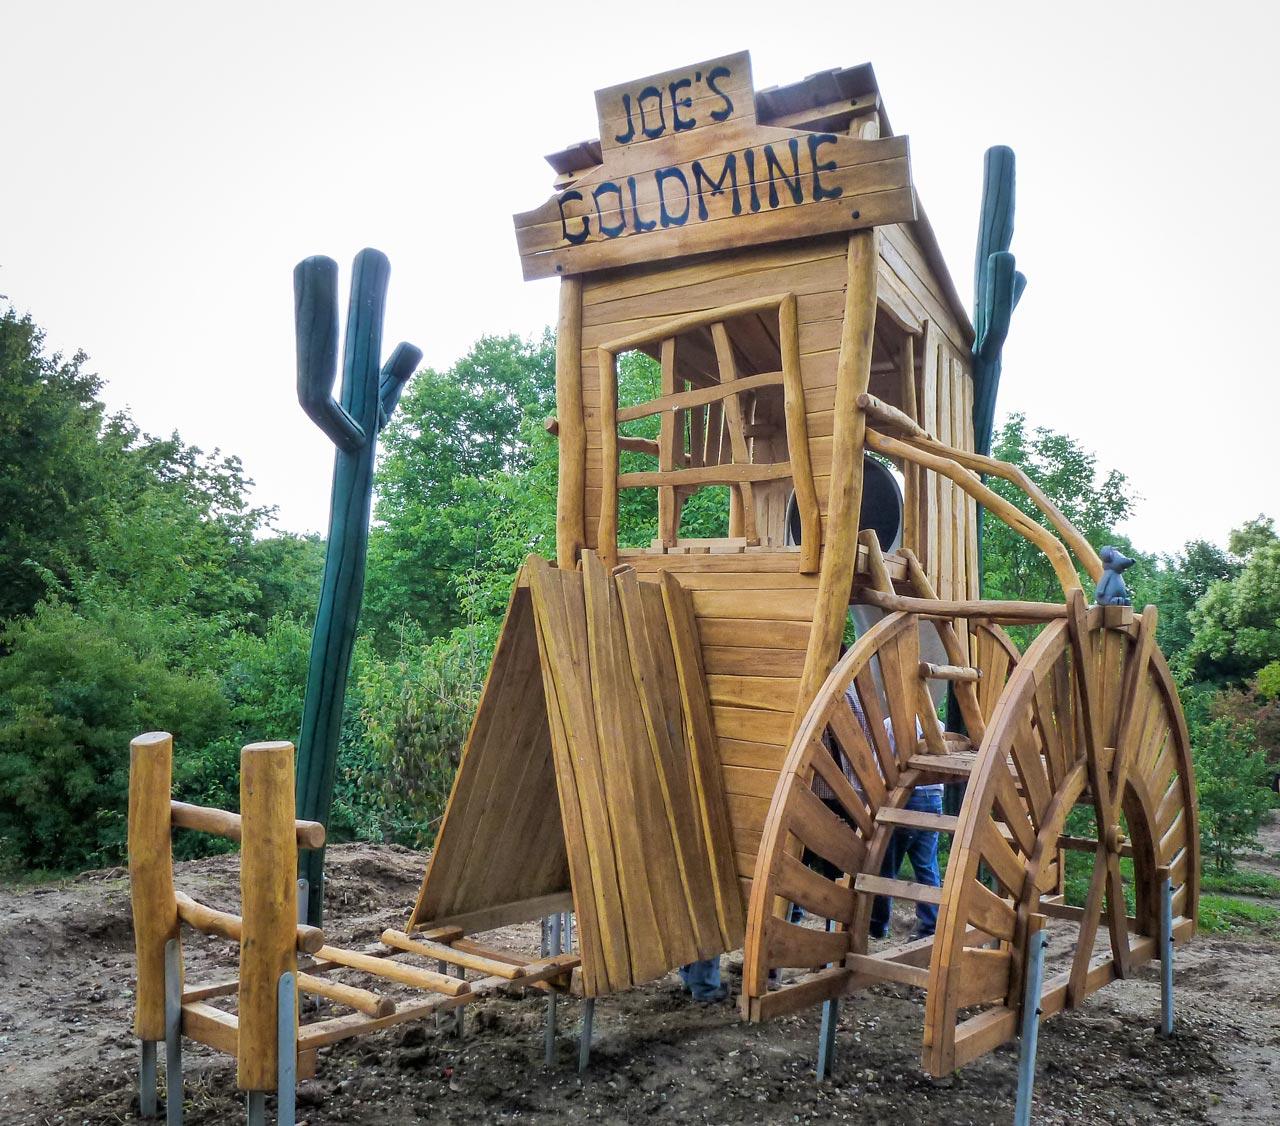 A 126 Themenspielplatz Joes Goldmine